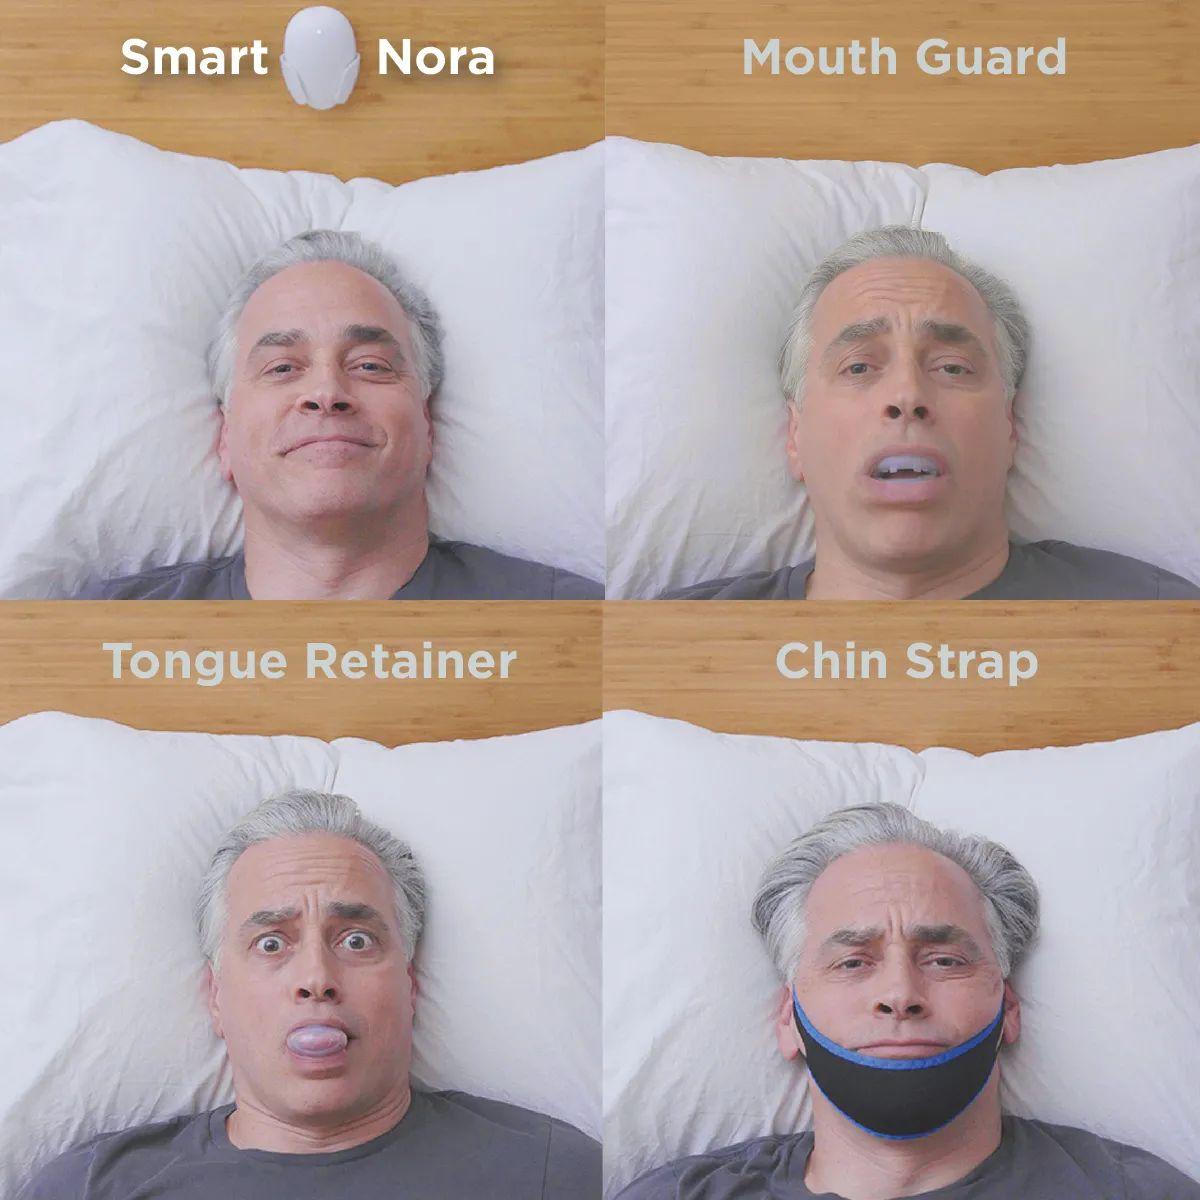 smart nora snoring solution